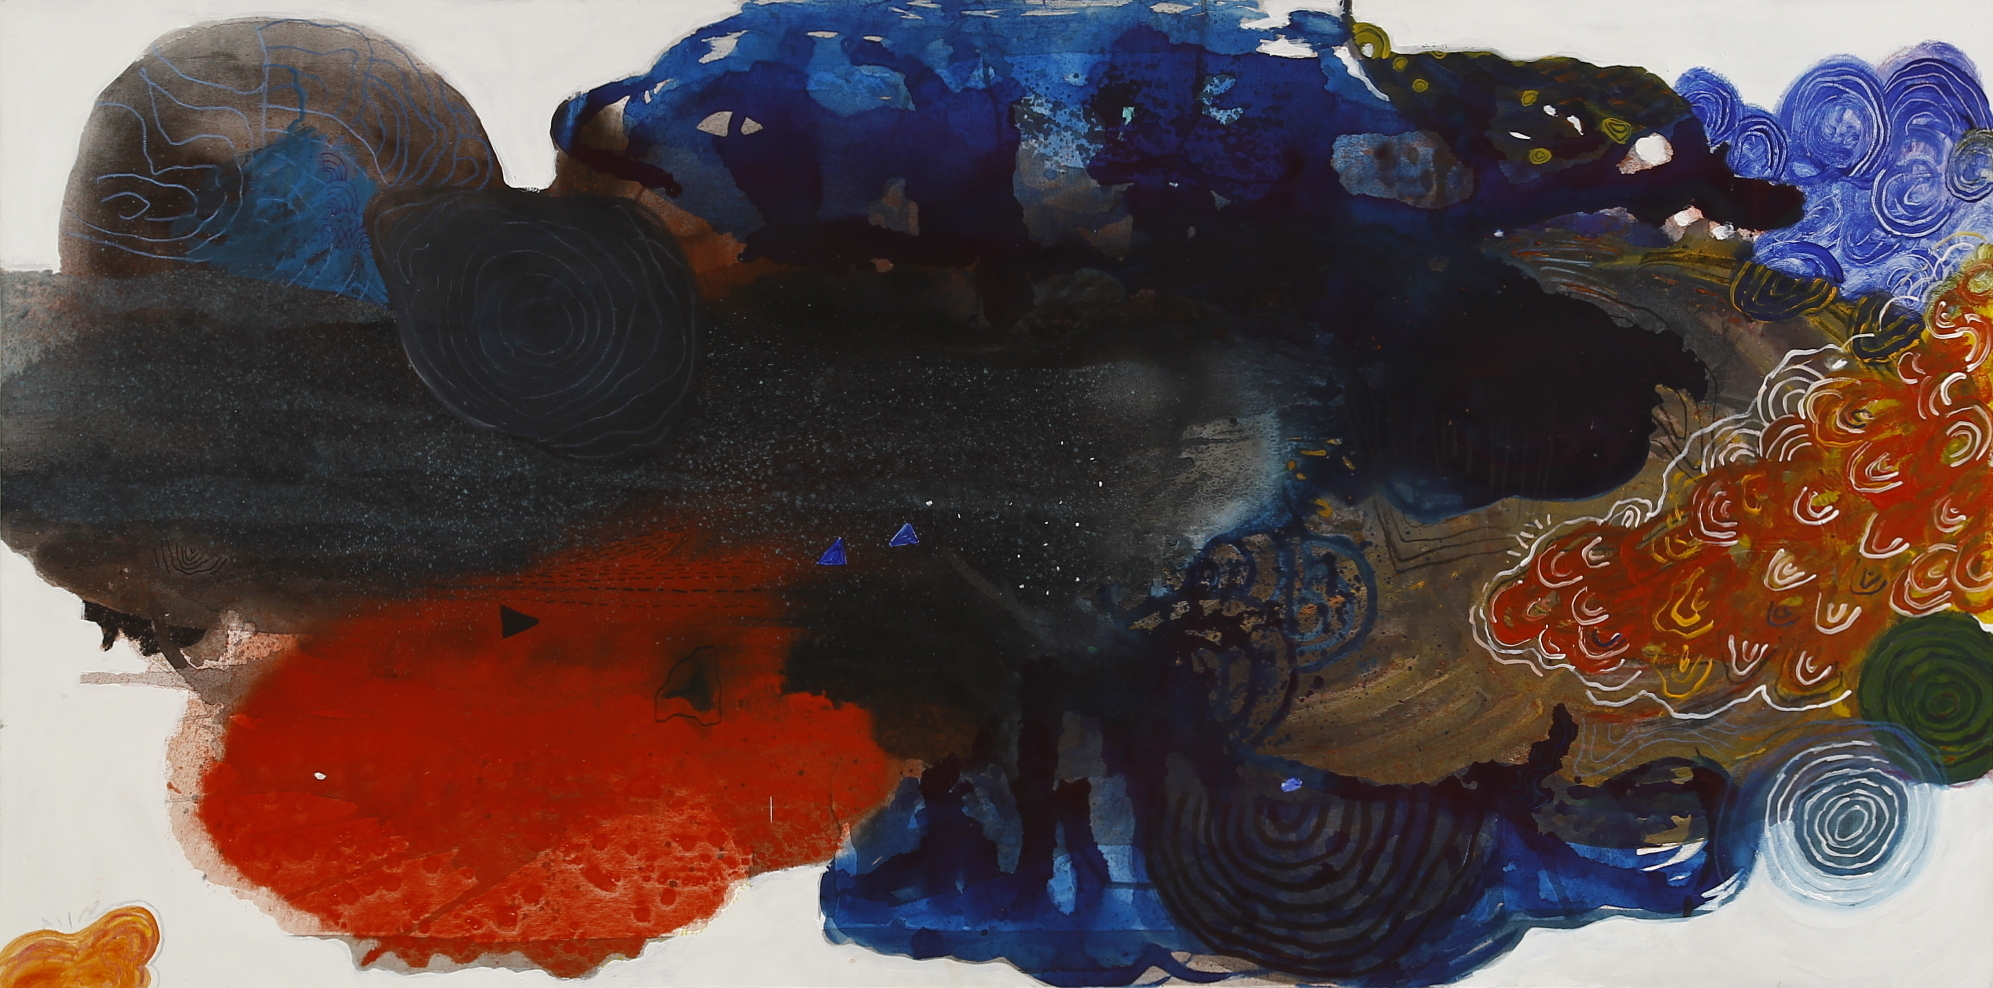 Luiz Aquila, A pintura, a pergunta e a pintura, Acrílica sobre tela, 100 x 200 cm, 2010